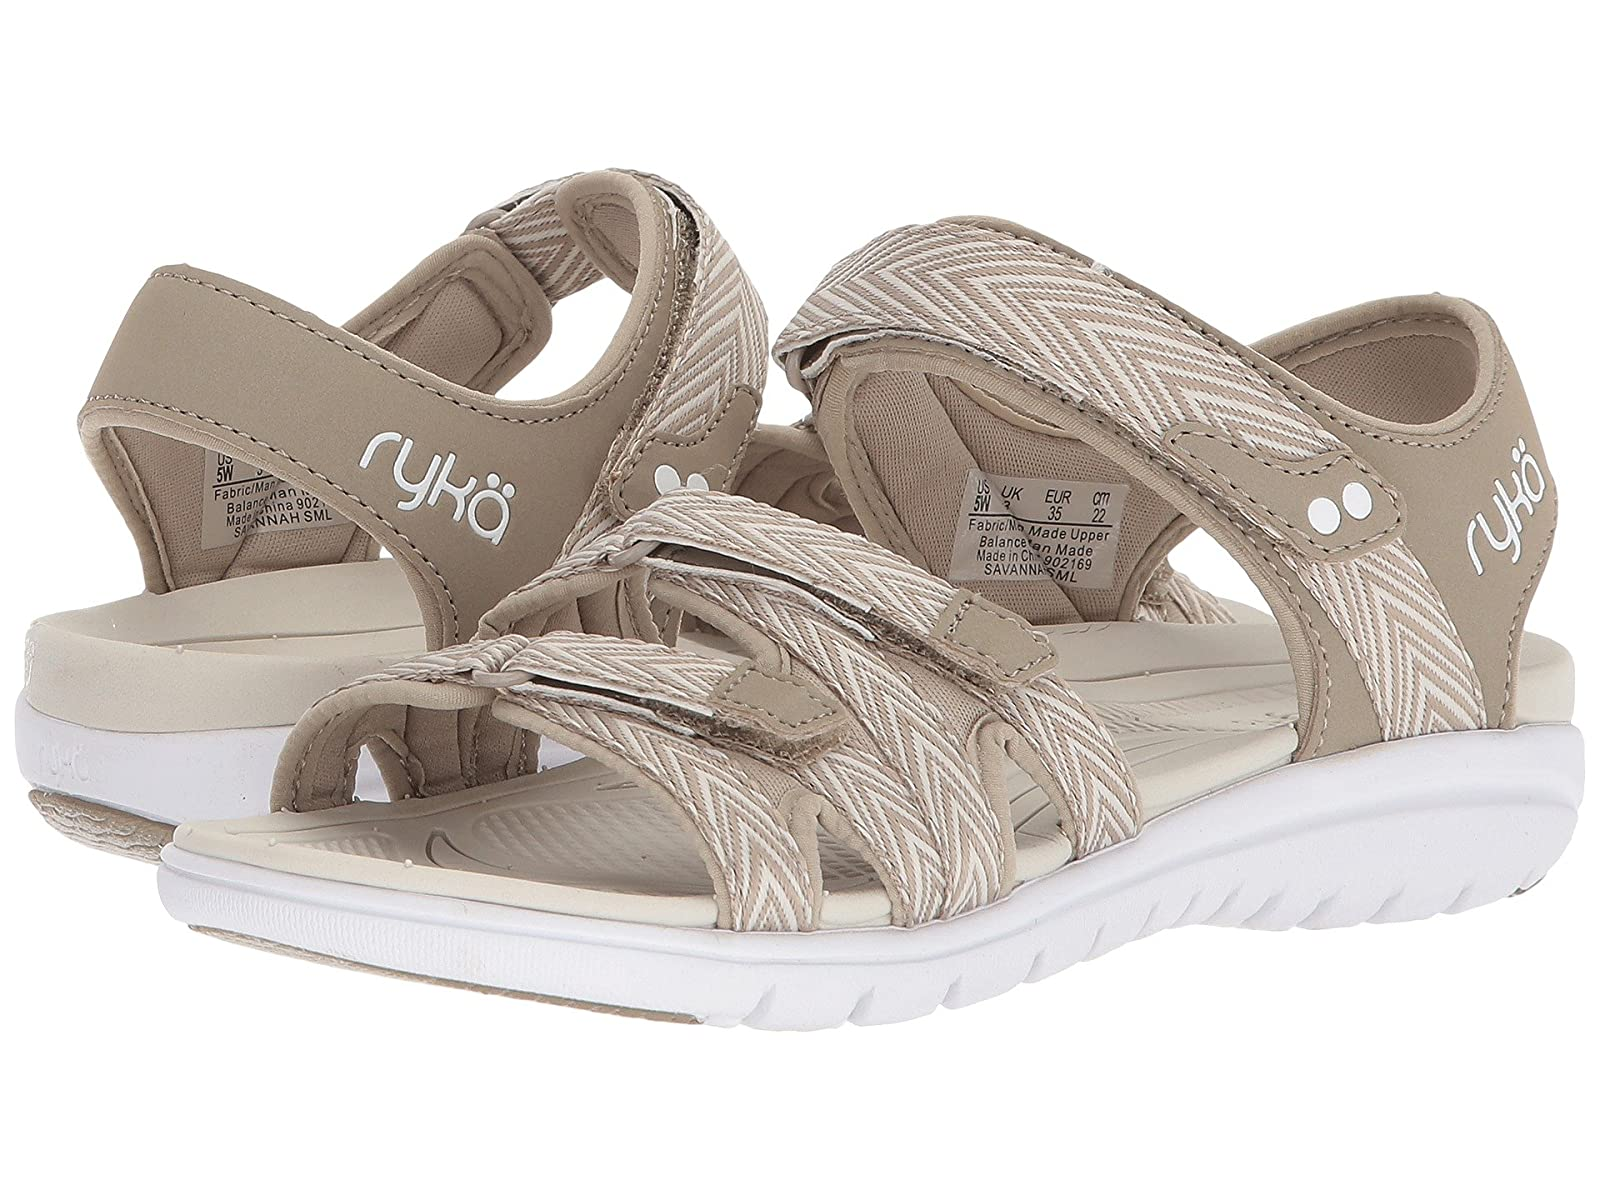 Ryka SavannahAtmospheric grades have affordable shoes